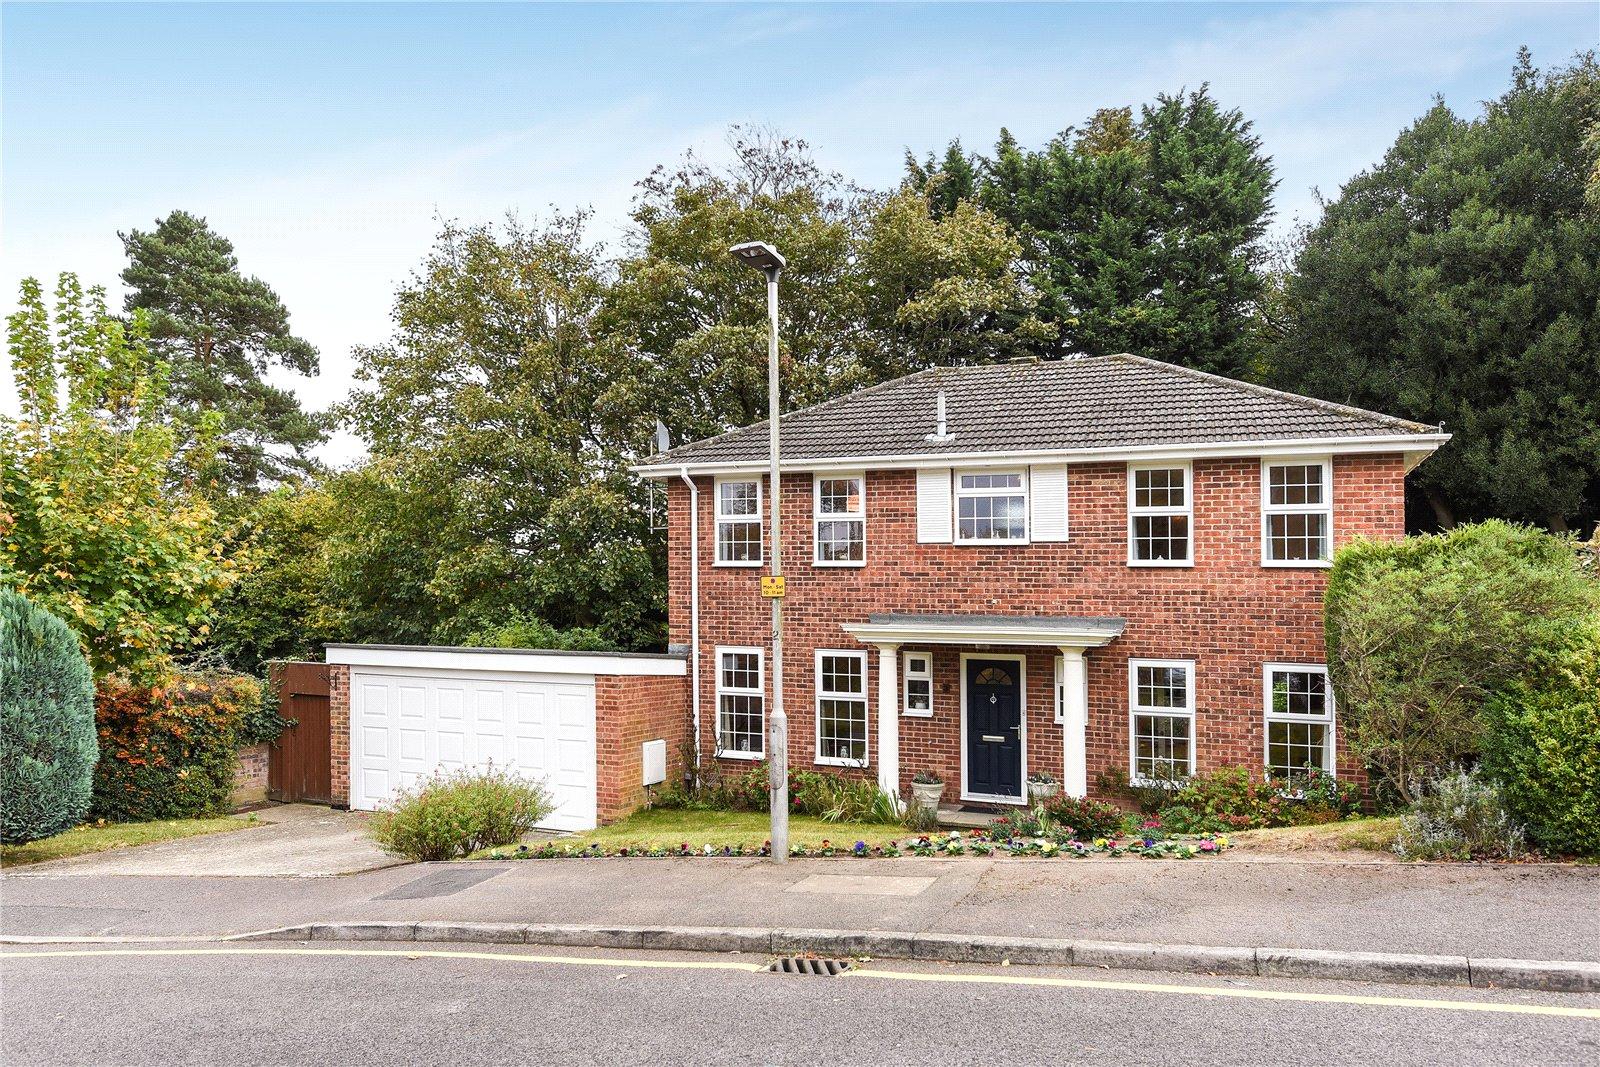 4 Bedrooms Detached House for sale in Beech Glen, Bracknell, Berkshire, RG12